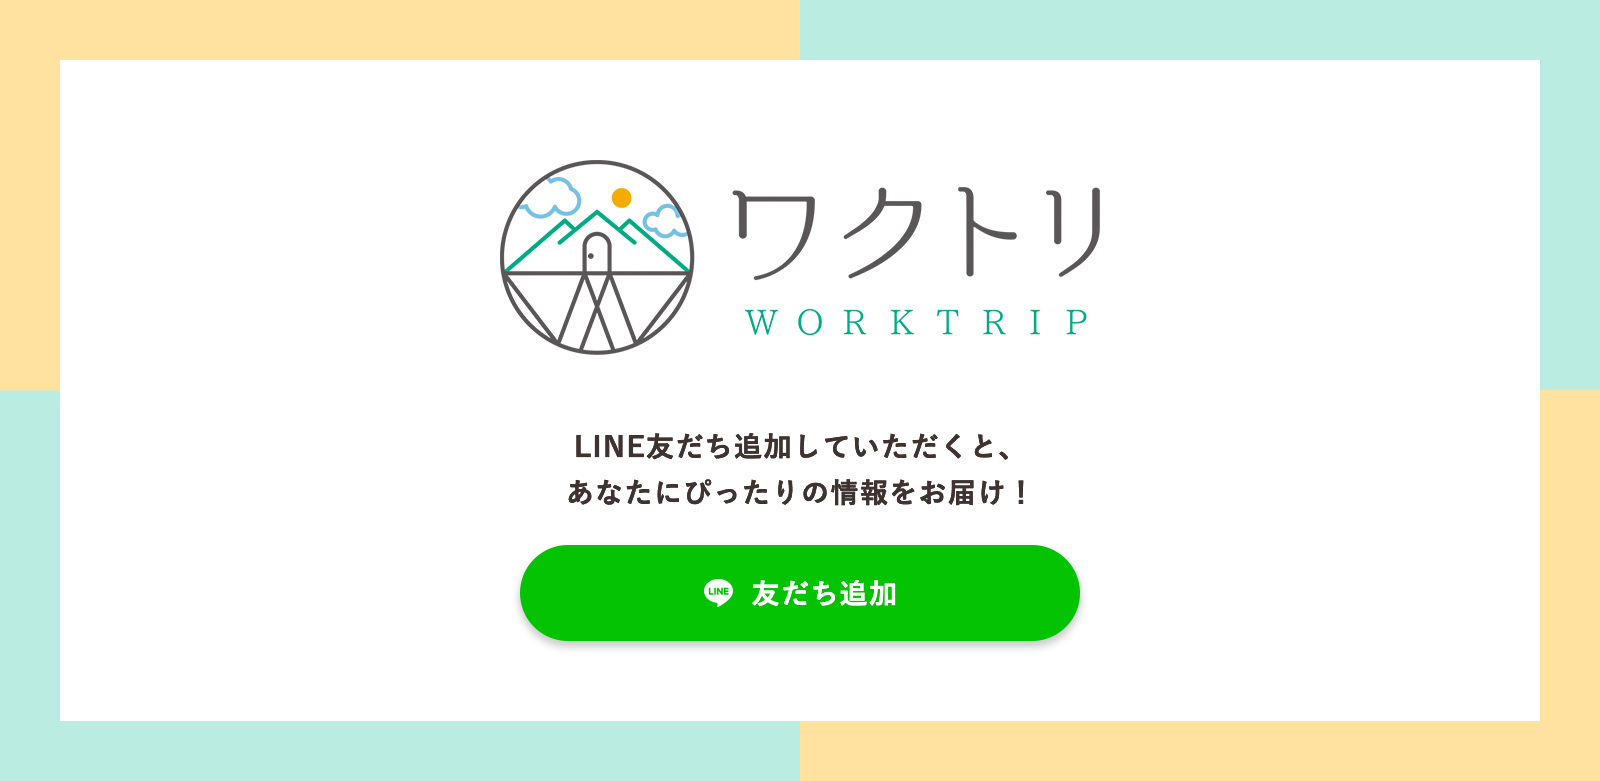 LINE公式アカウントを登録してオトクな情報をゲットしよう!